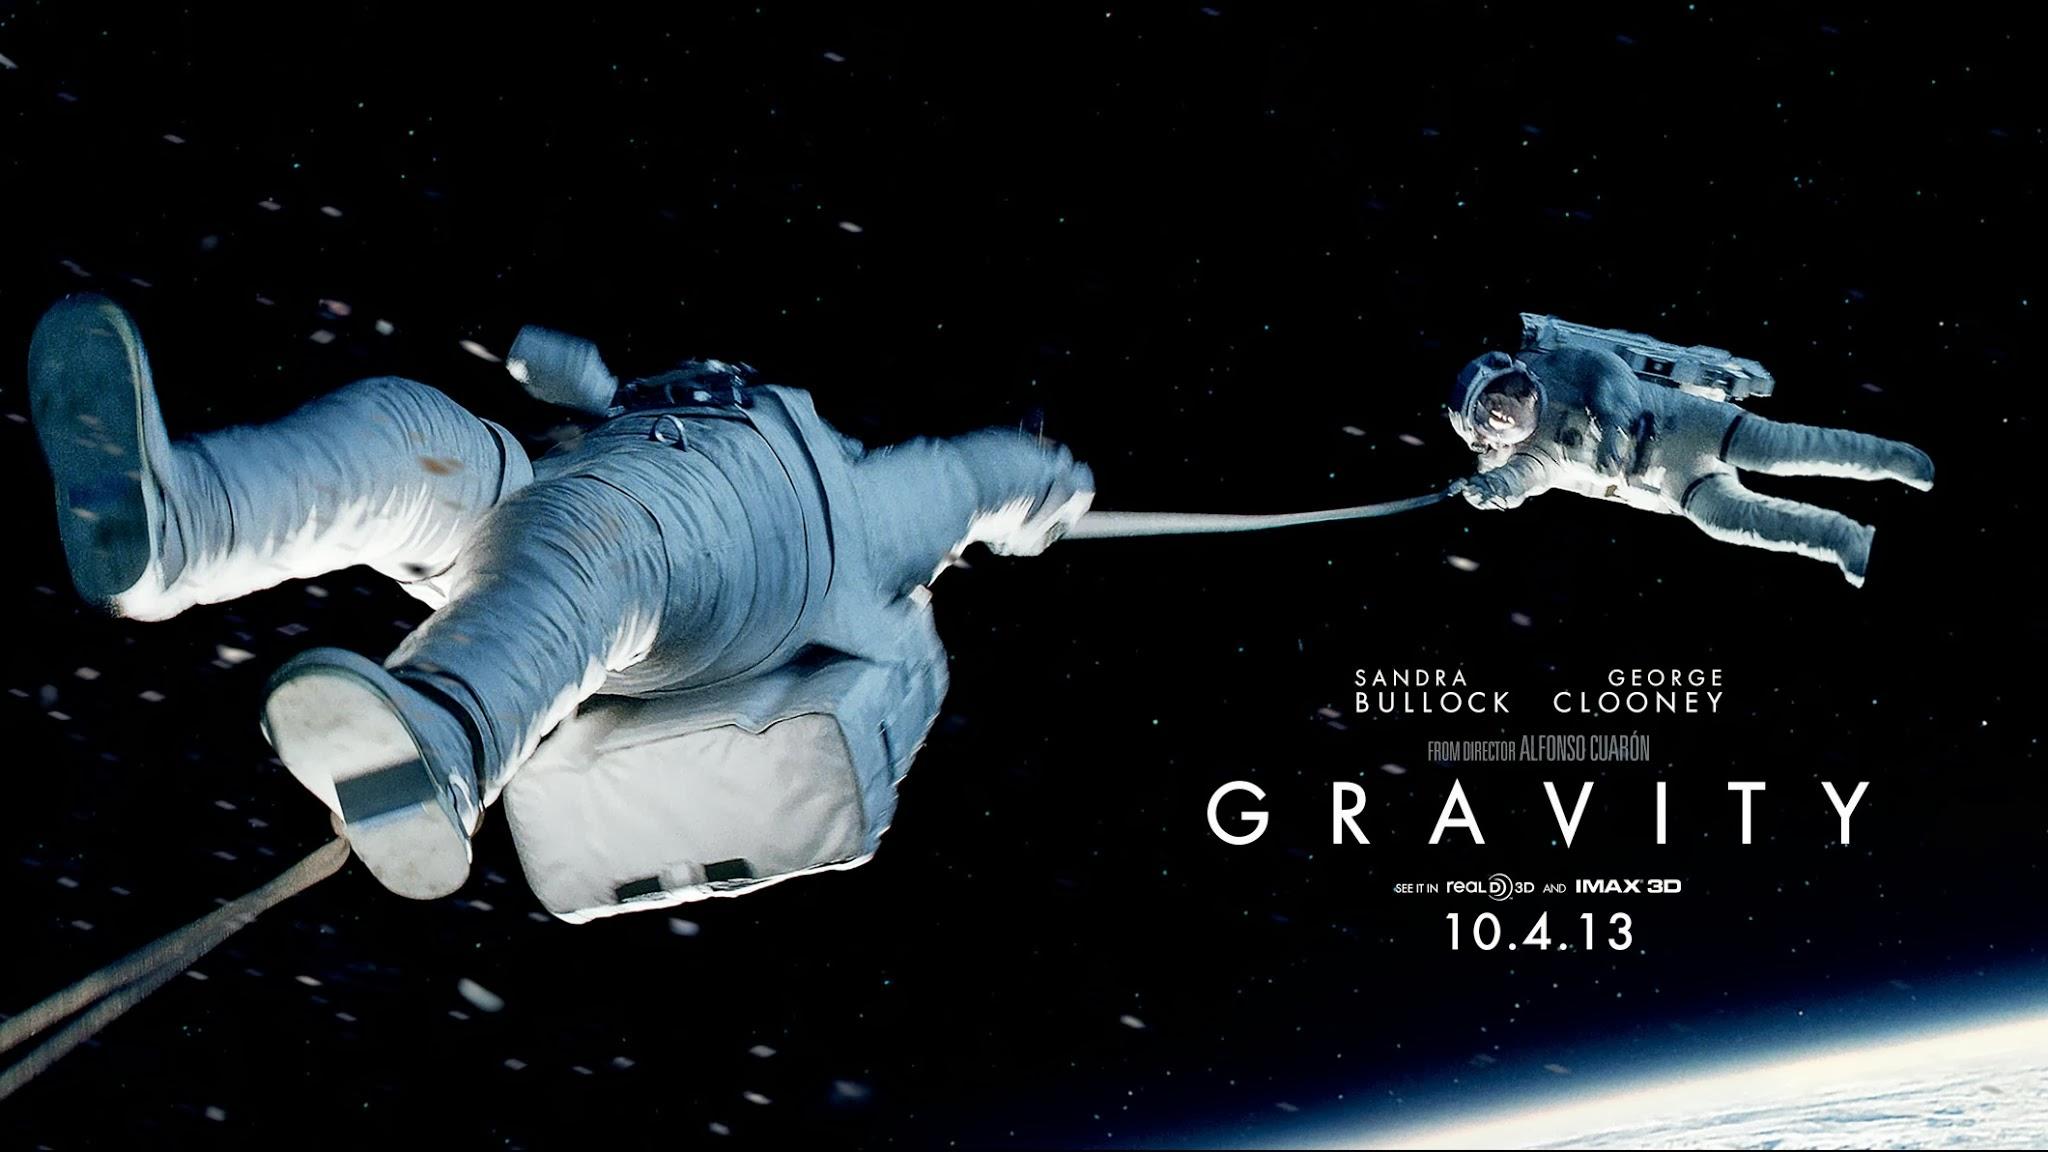 Vem Spela Dr Ryan Stone I Filmen Gravity